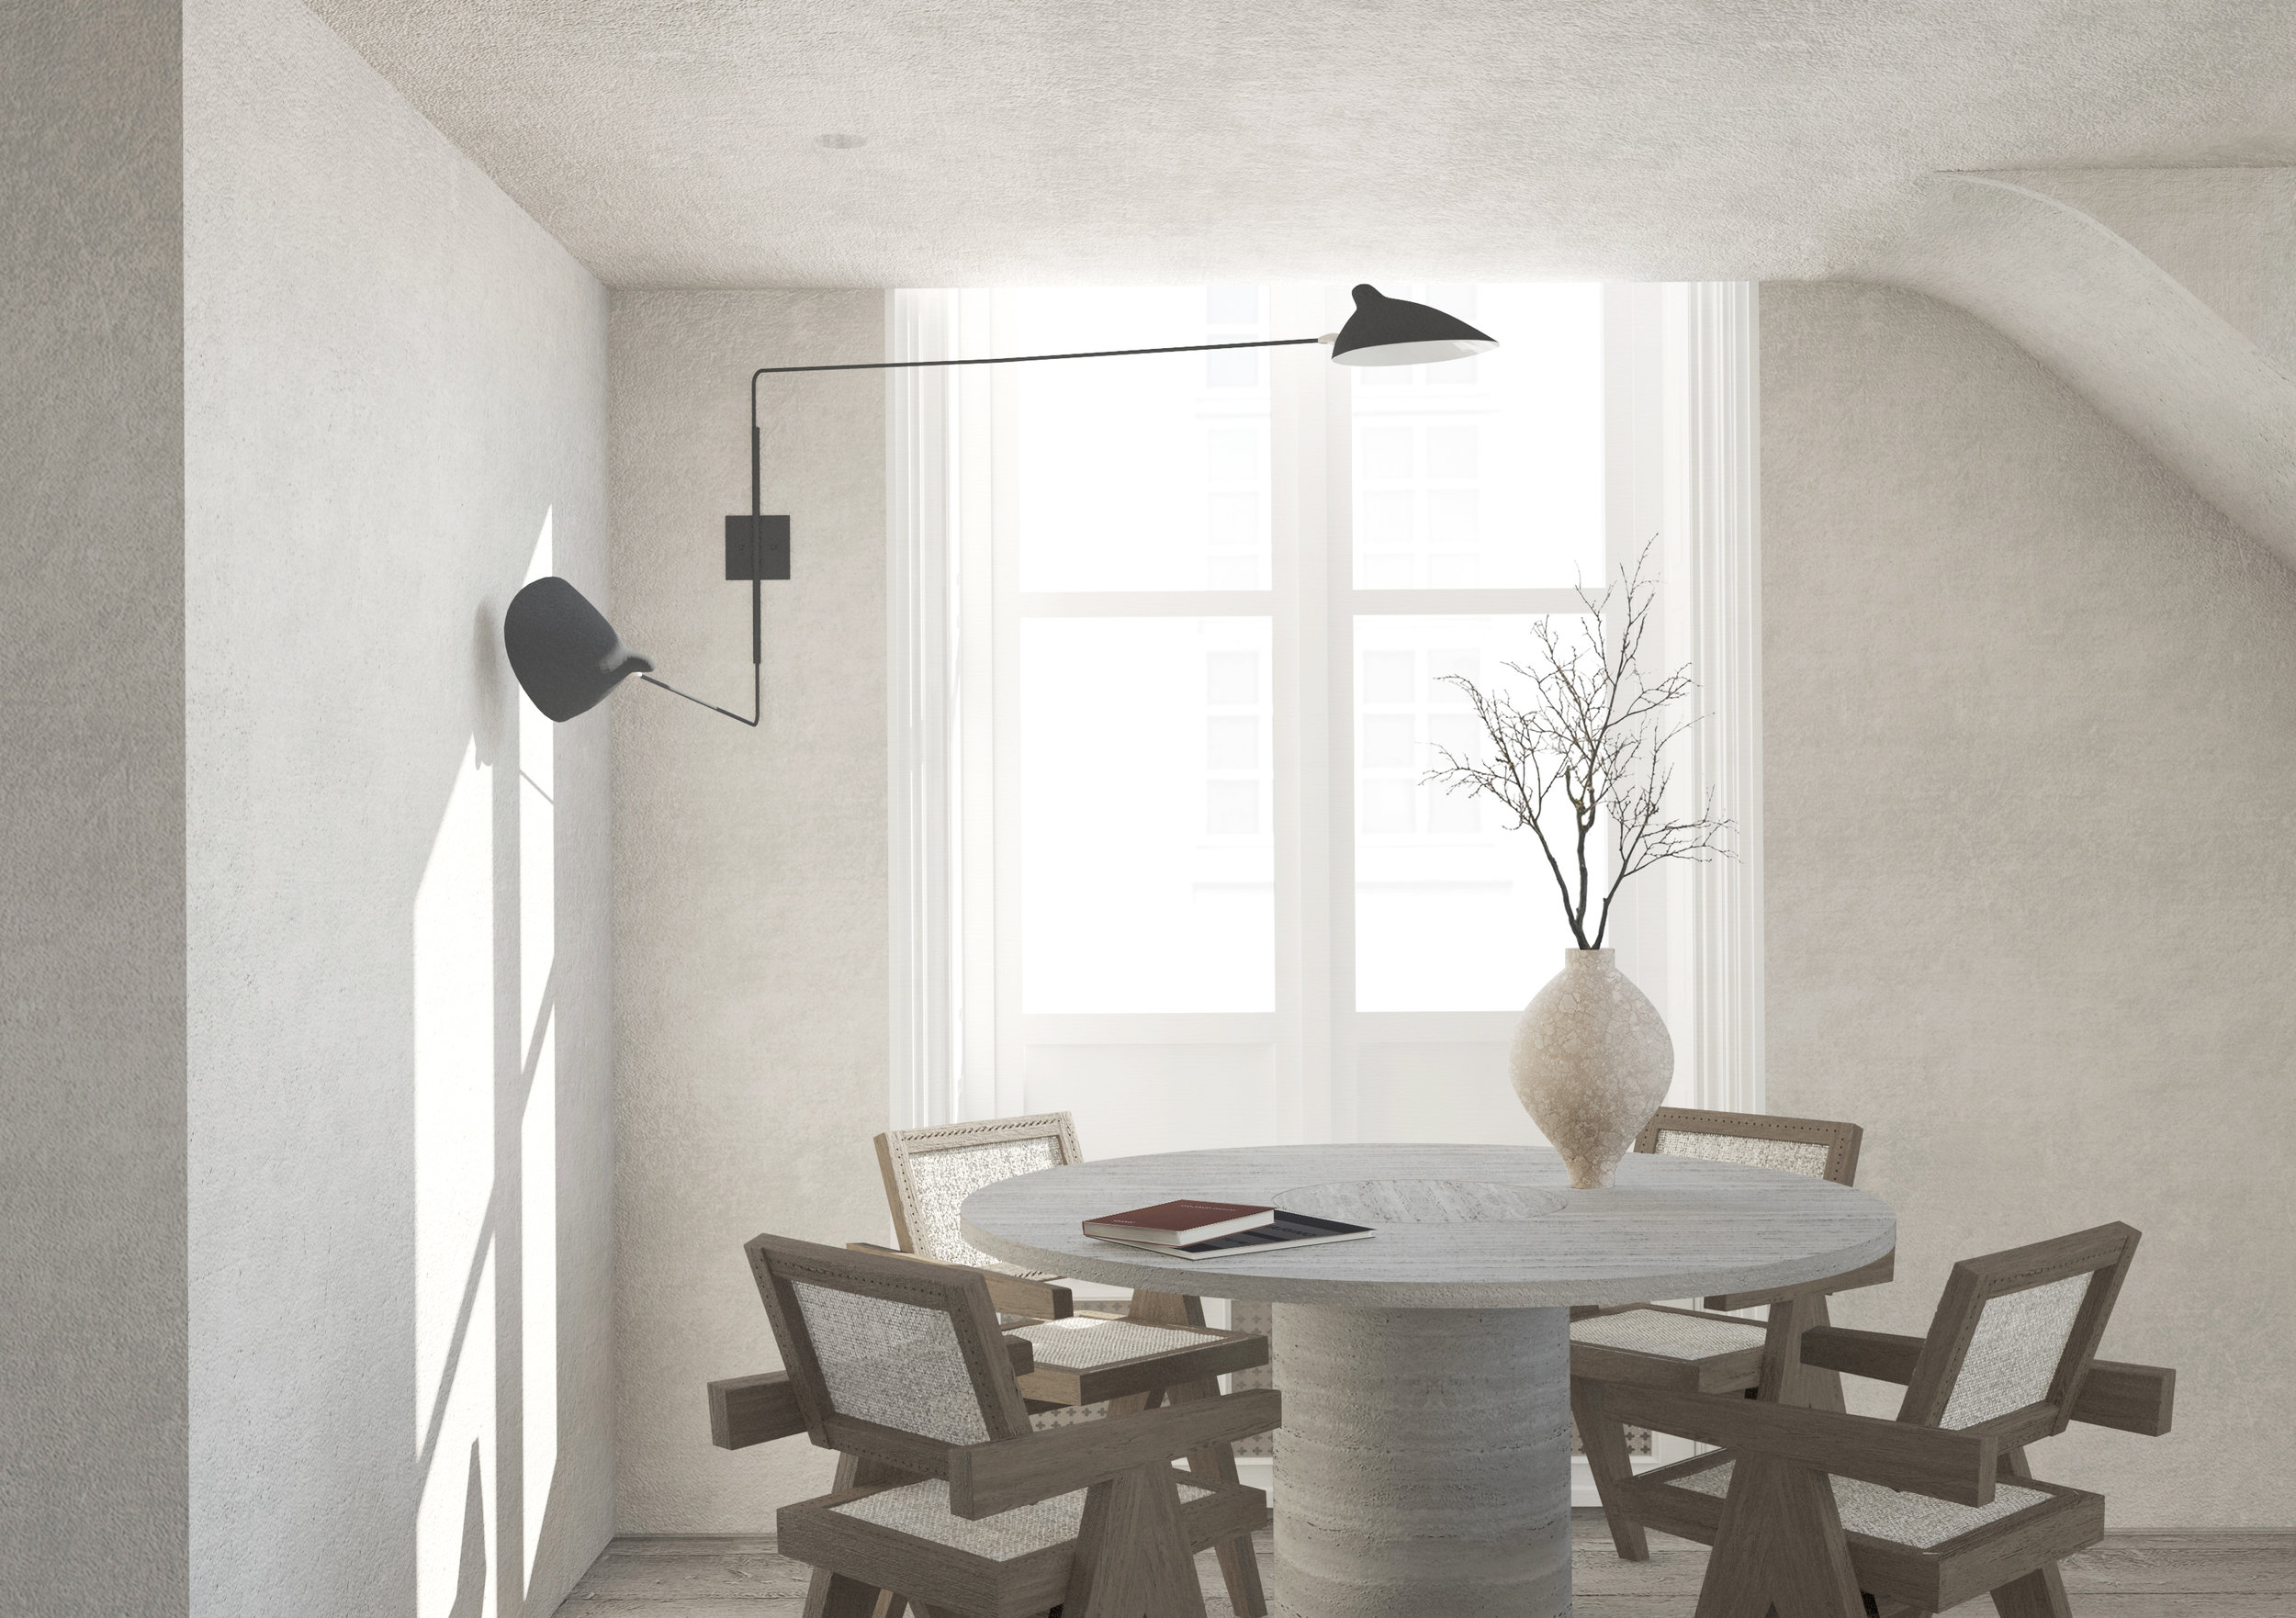 IA_Ivan_Oddos_Valeriane_Lazard_Grand_Veneur_Dining_Room.jpg